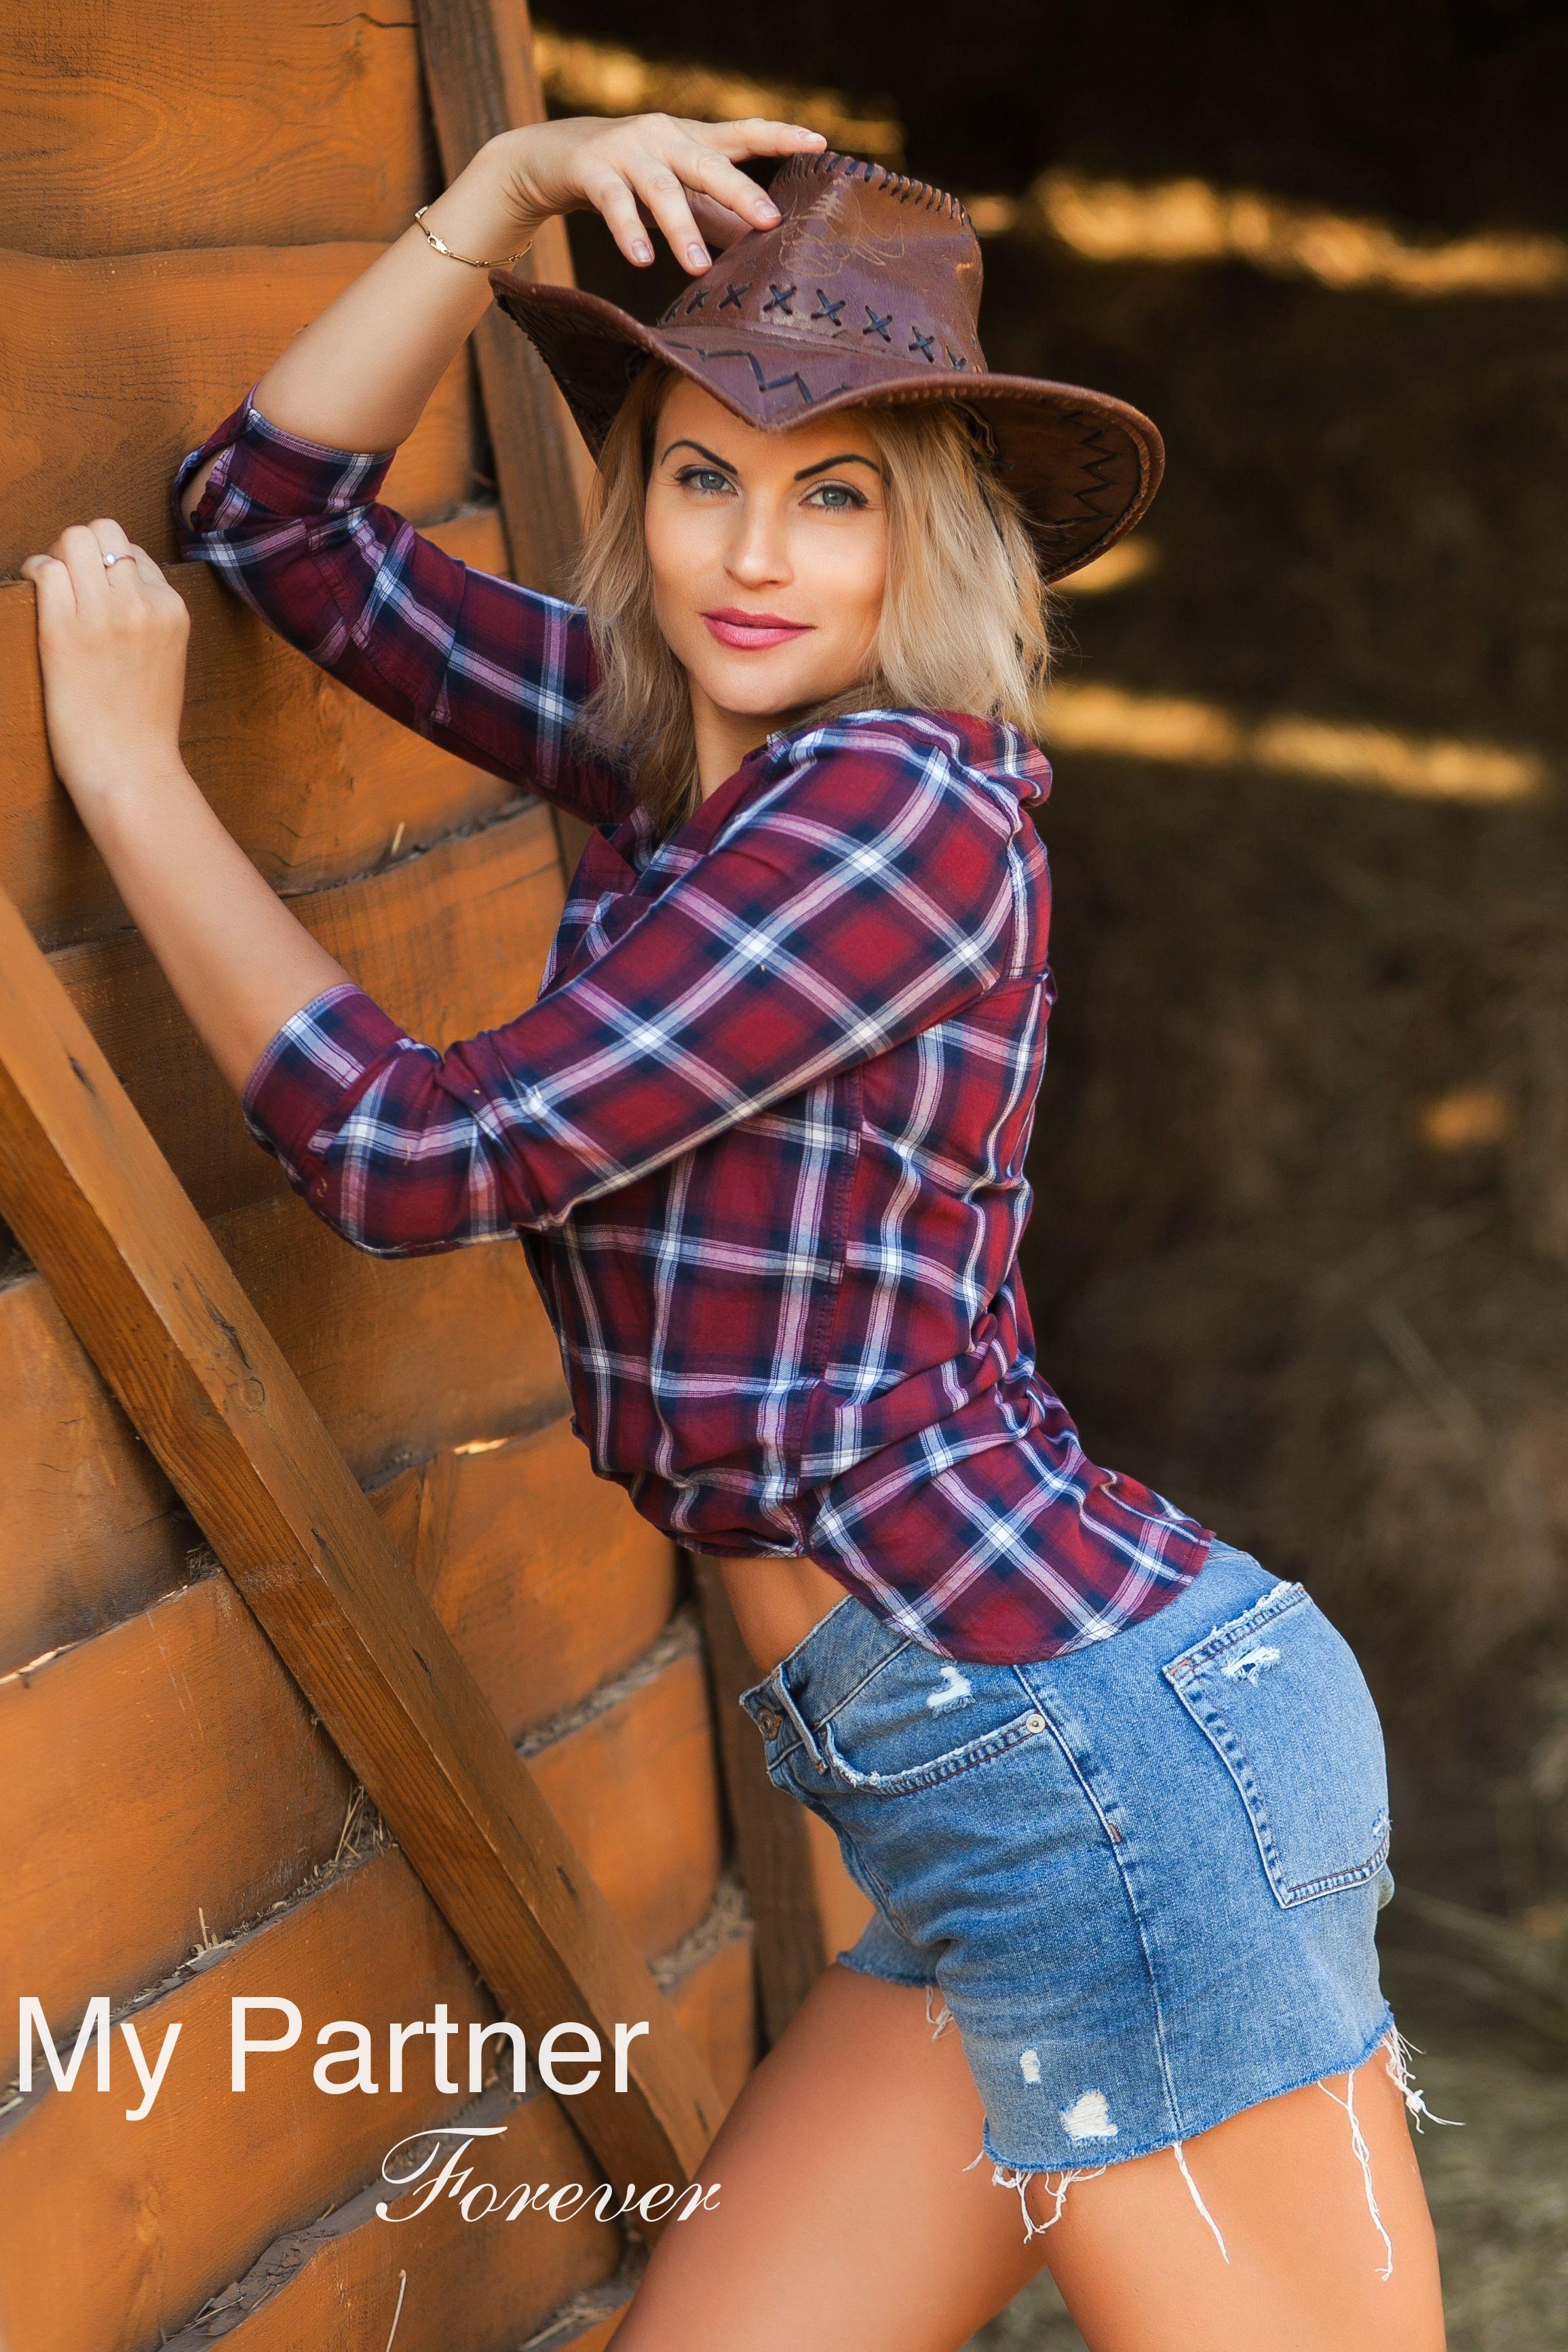 Charming Lady from Ukraine - Tatiyana from Poltava, Ukraine